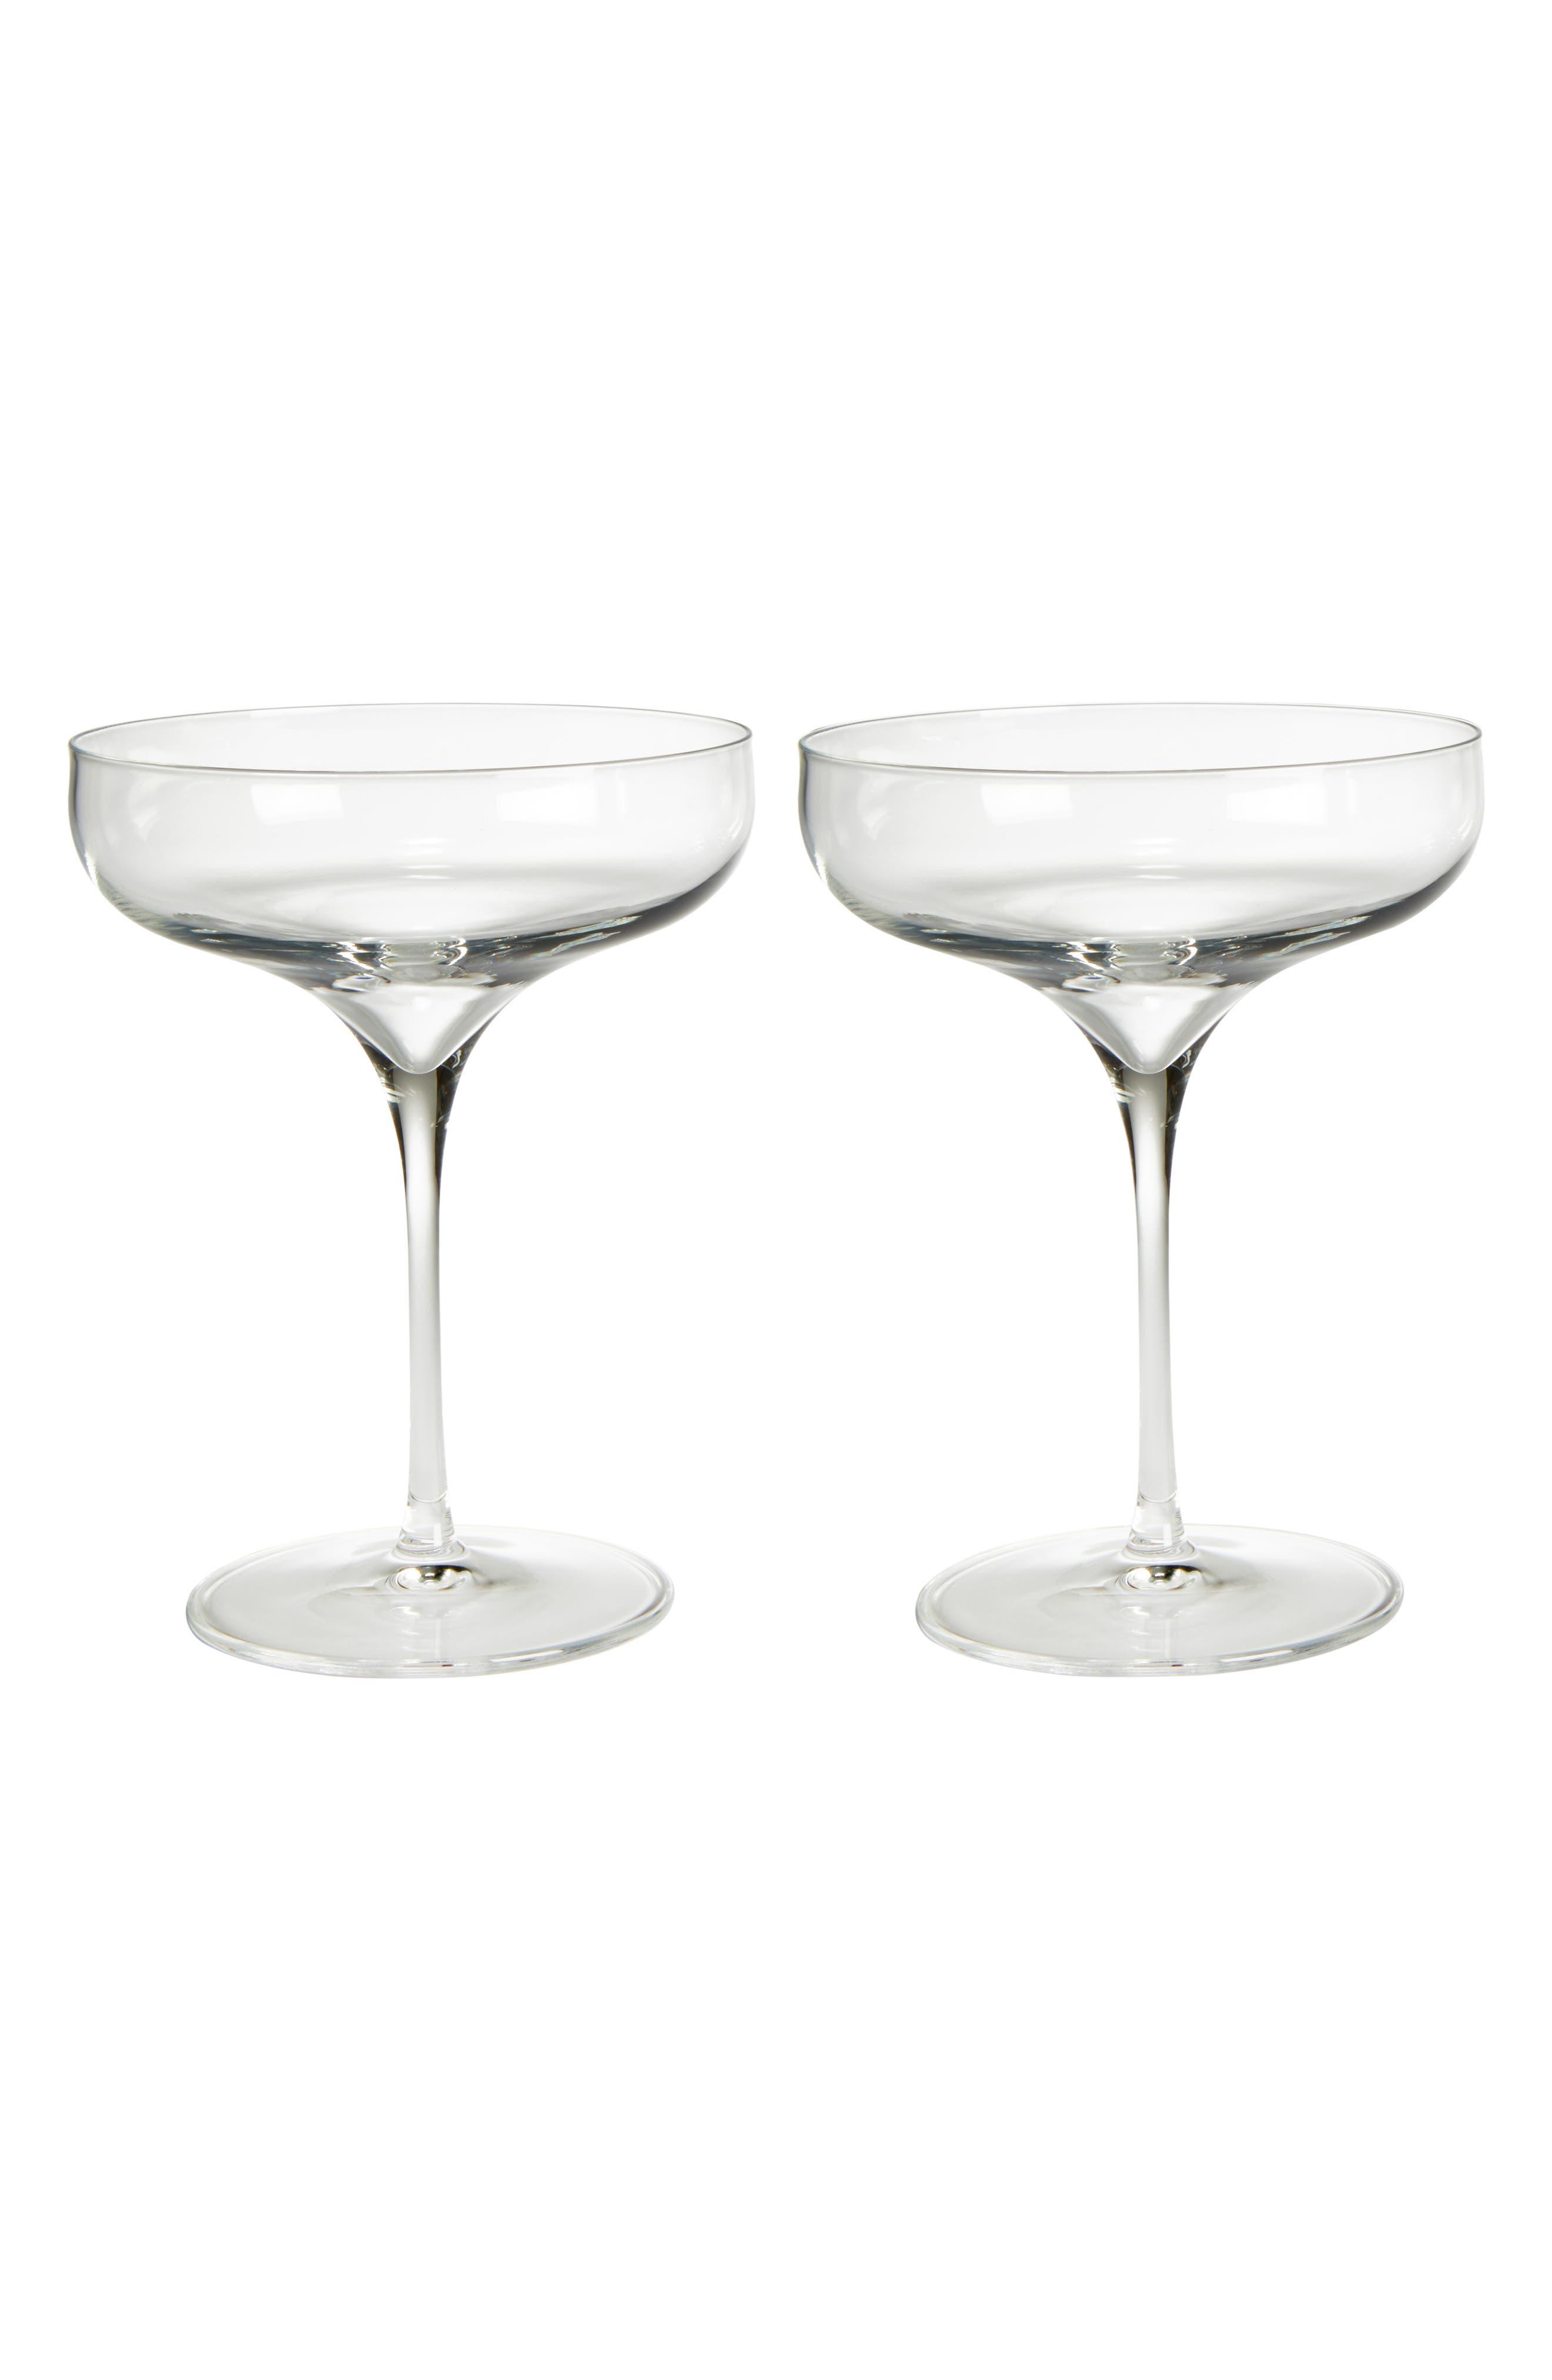 Luigi Bormiolo Vinea Moscato/Spumante Set of 2 Coupe Glasses,                         Main,                         color, 100